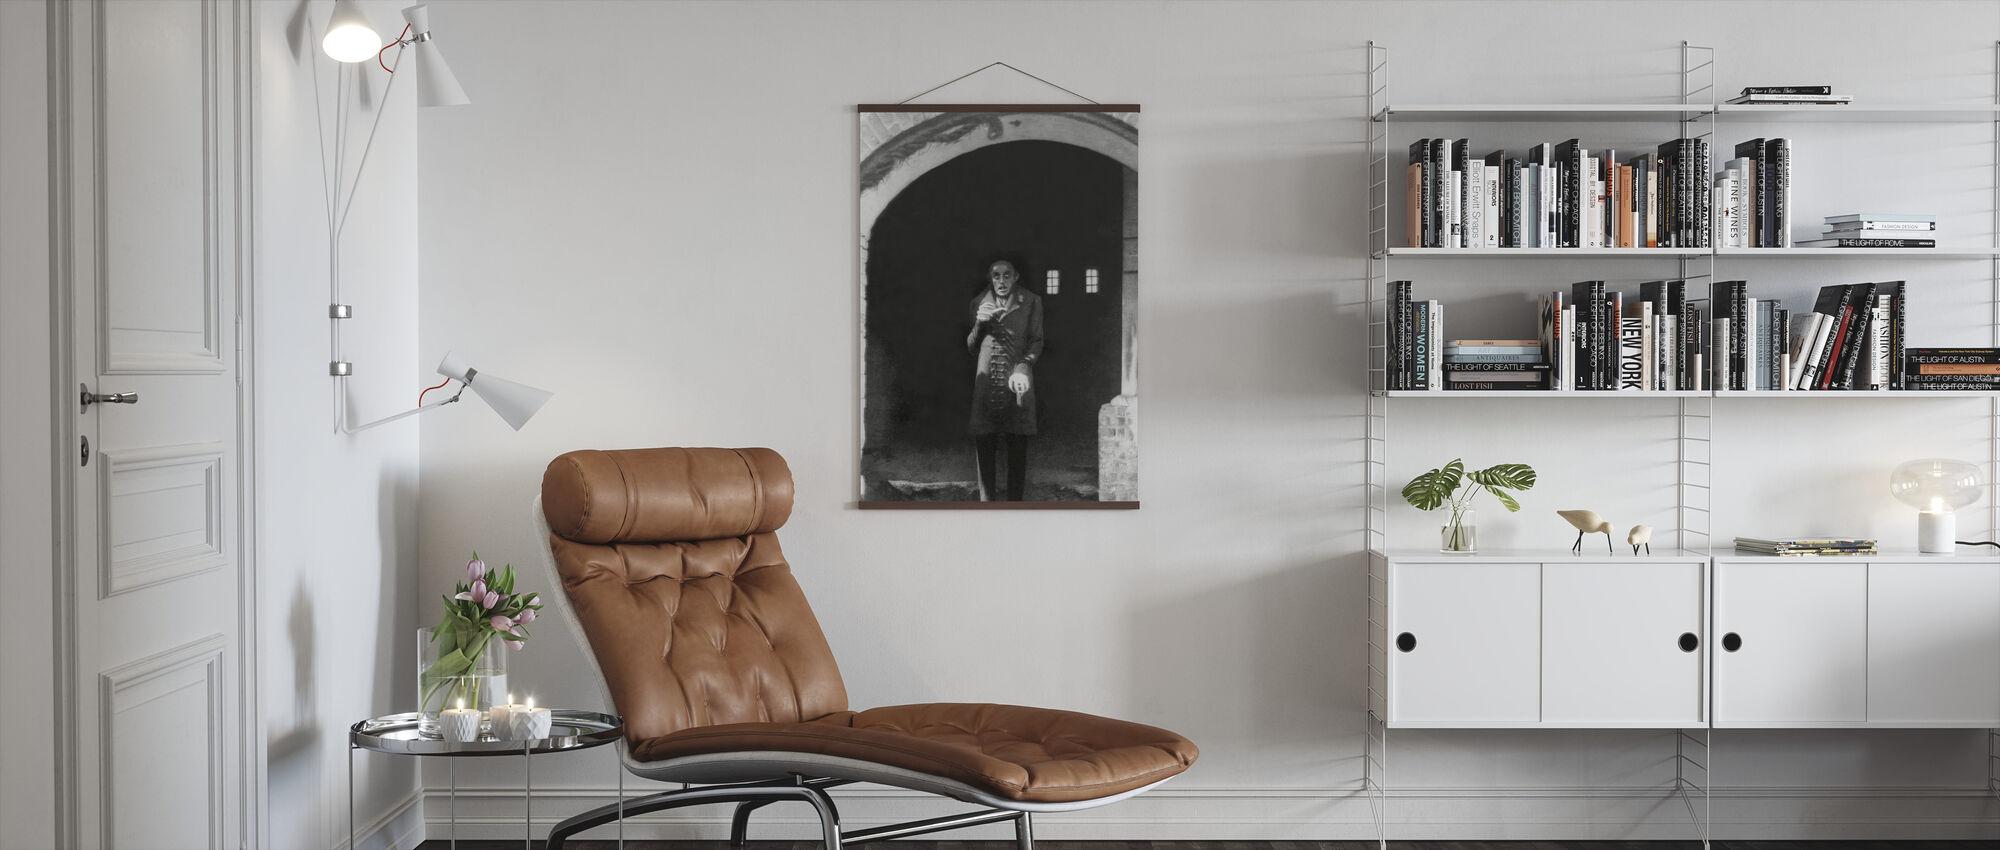 Vampire - Max Schreck - Poster - Living Room